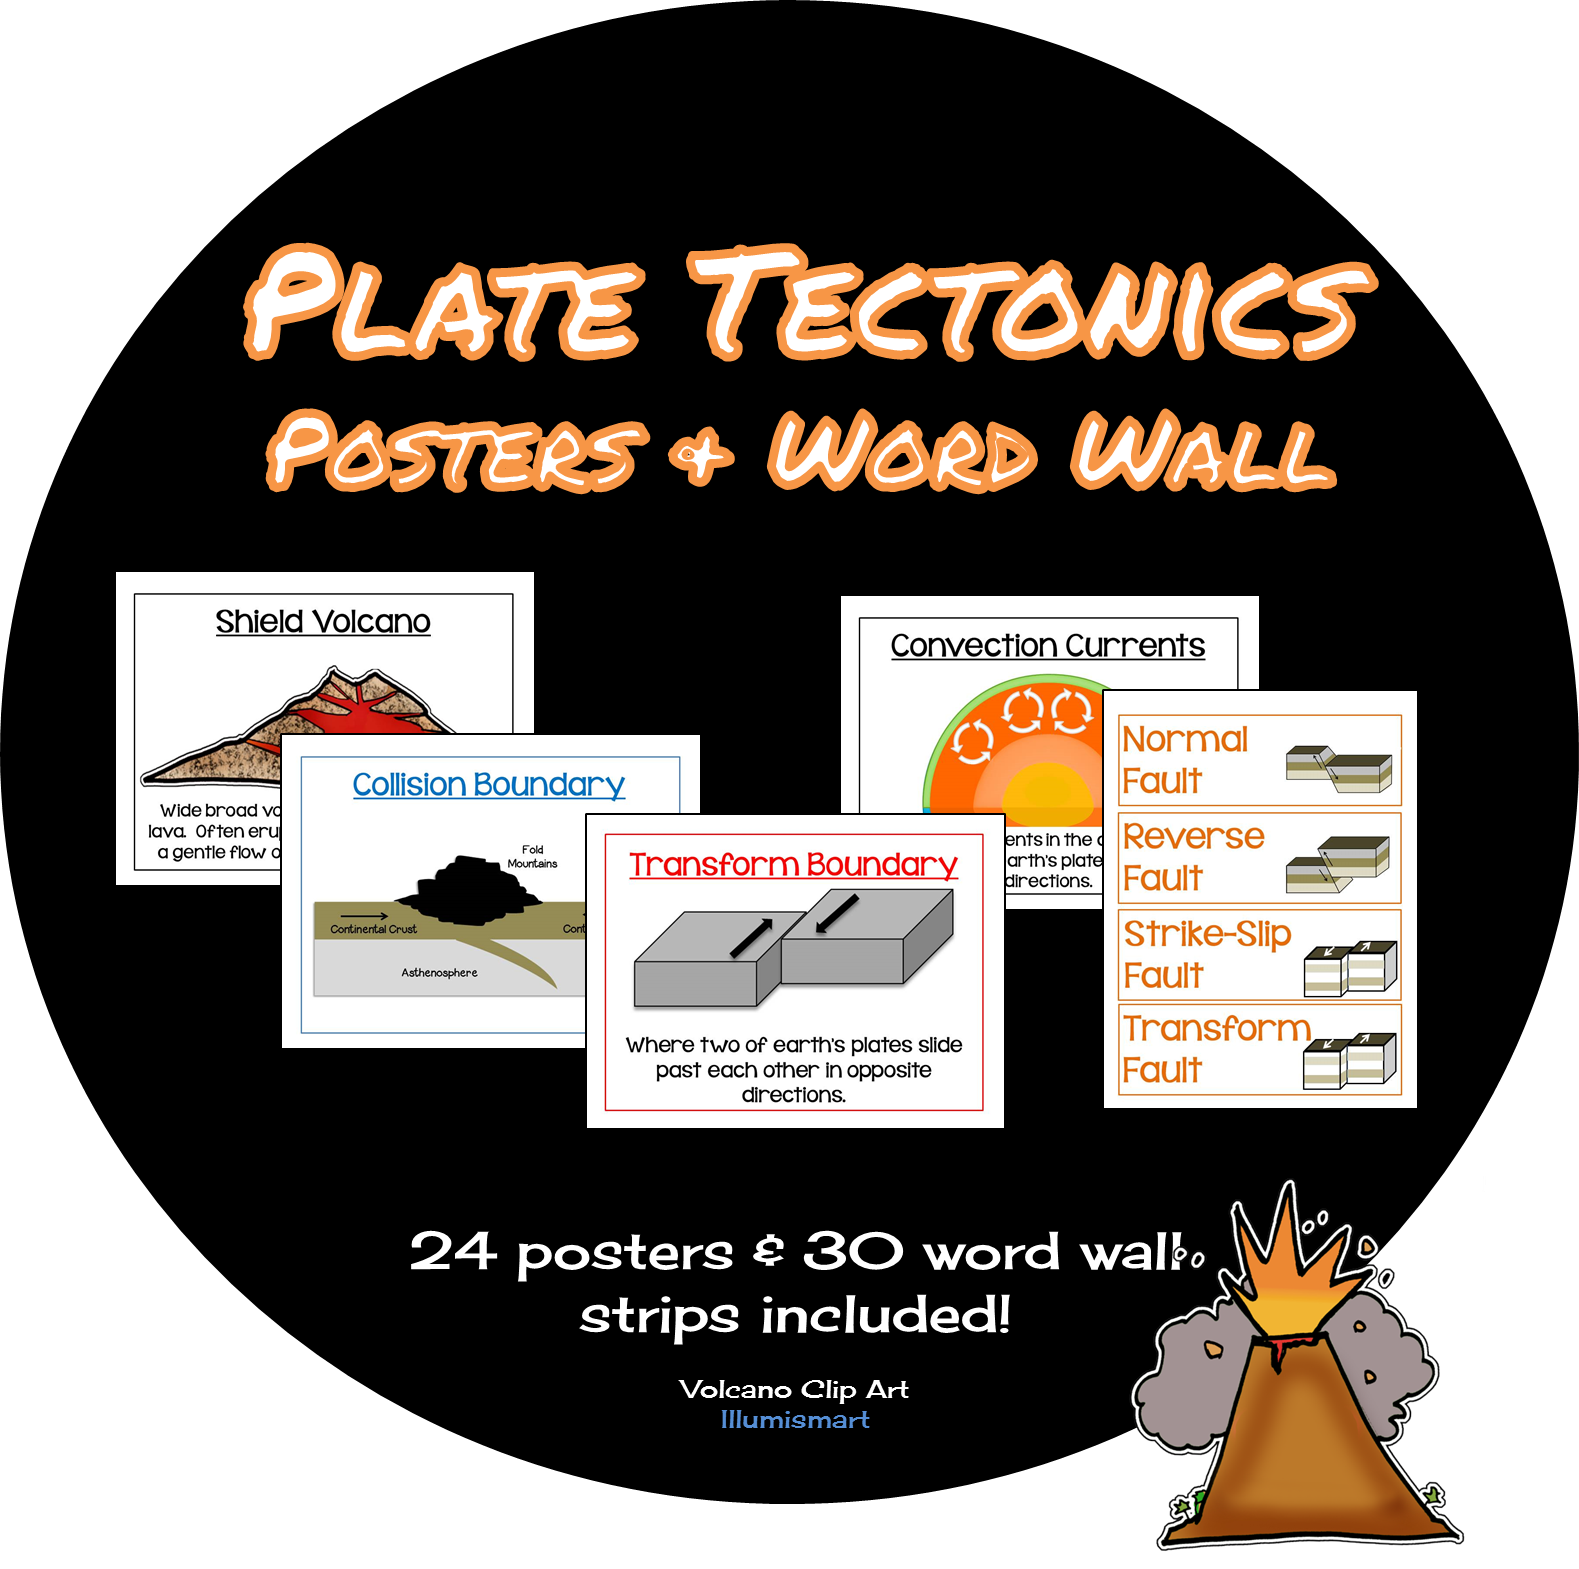 Plate Tectonics  Volcanoes, Plate Boundaries & Earthquake Faults Posters